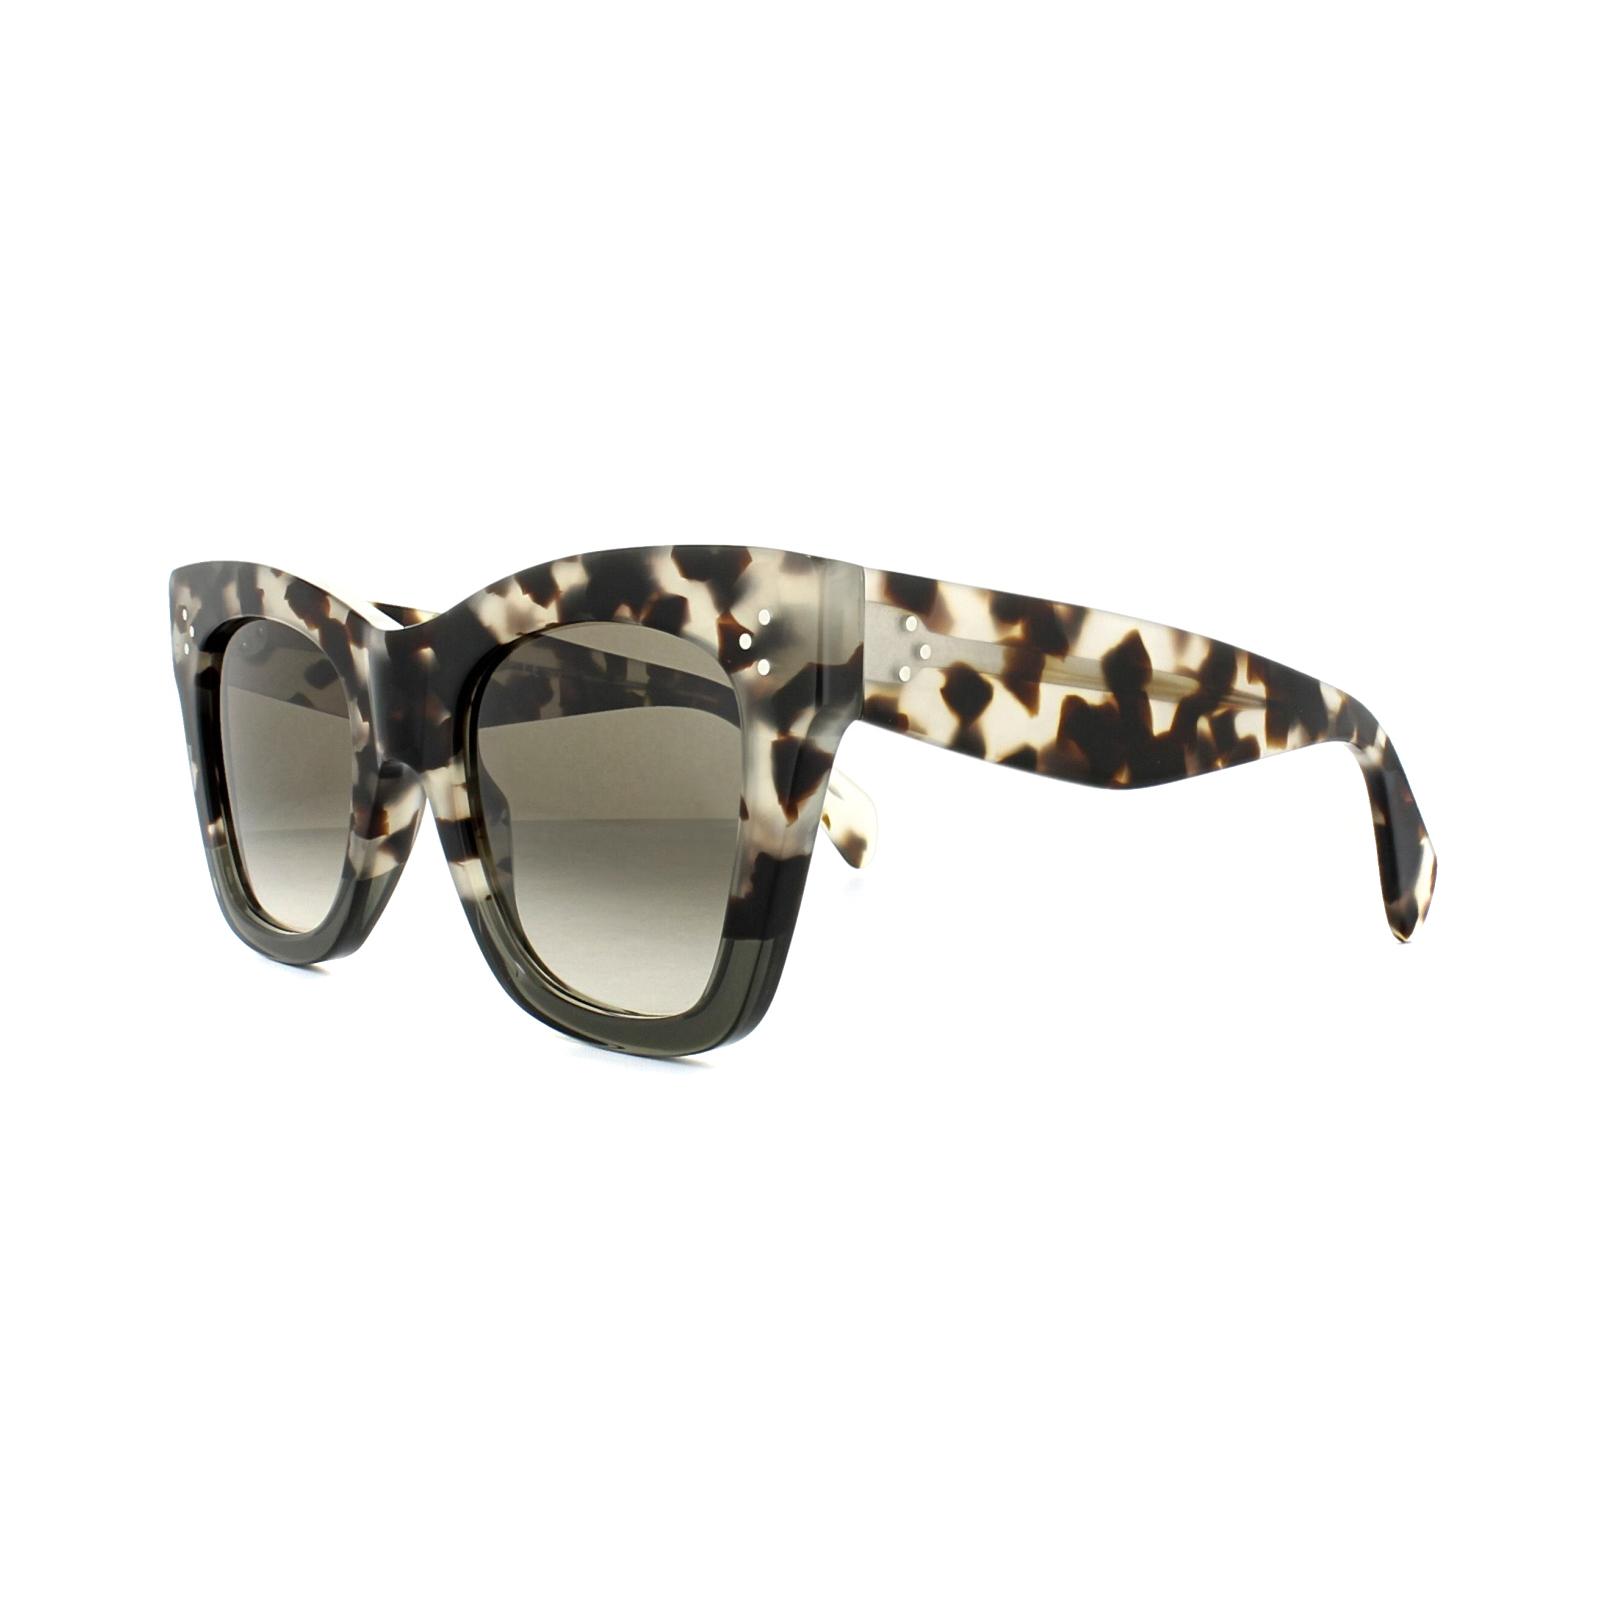 a669a0bd41e Celine Sunglasses 41090 s